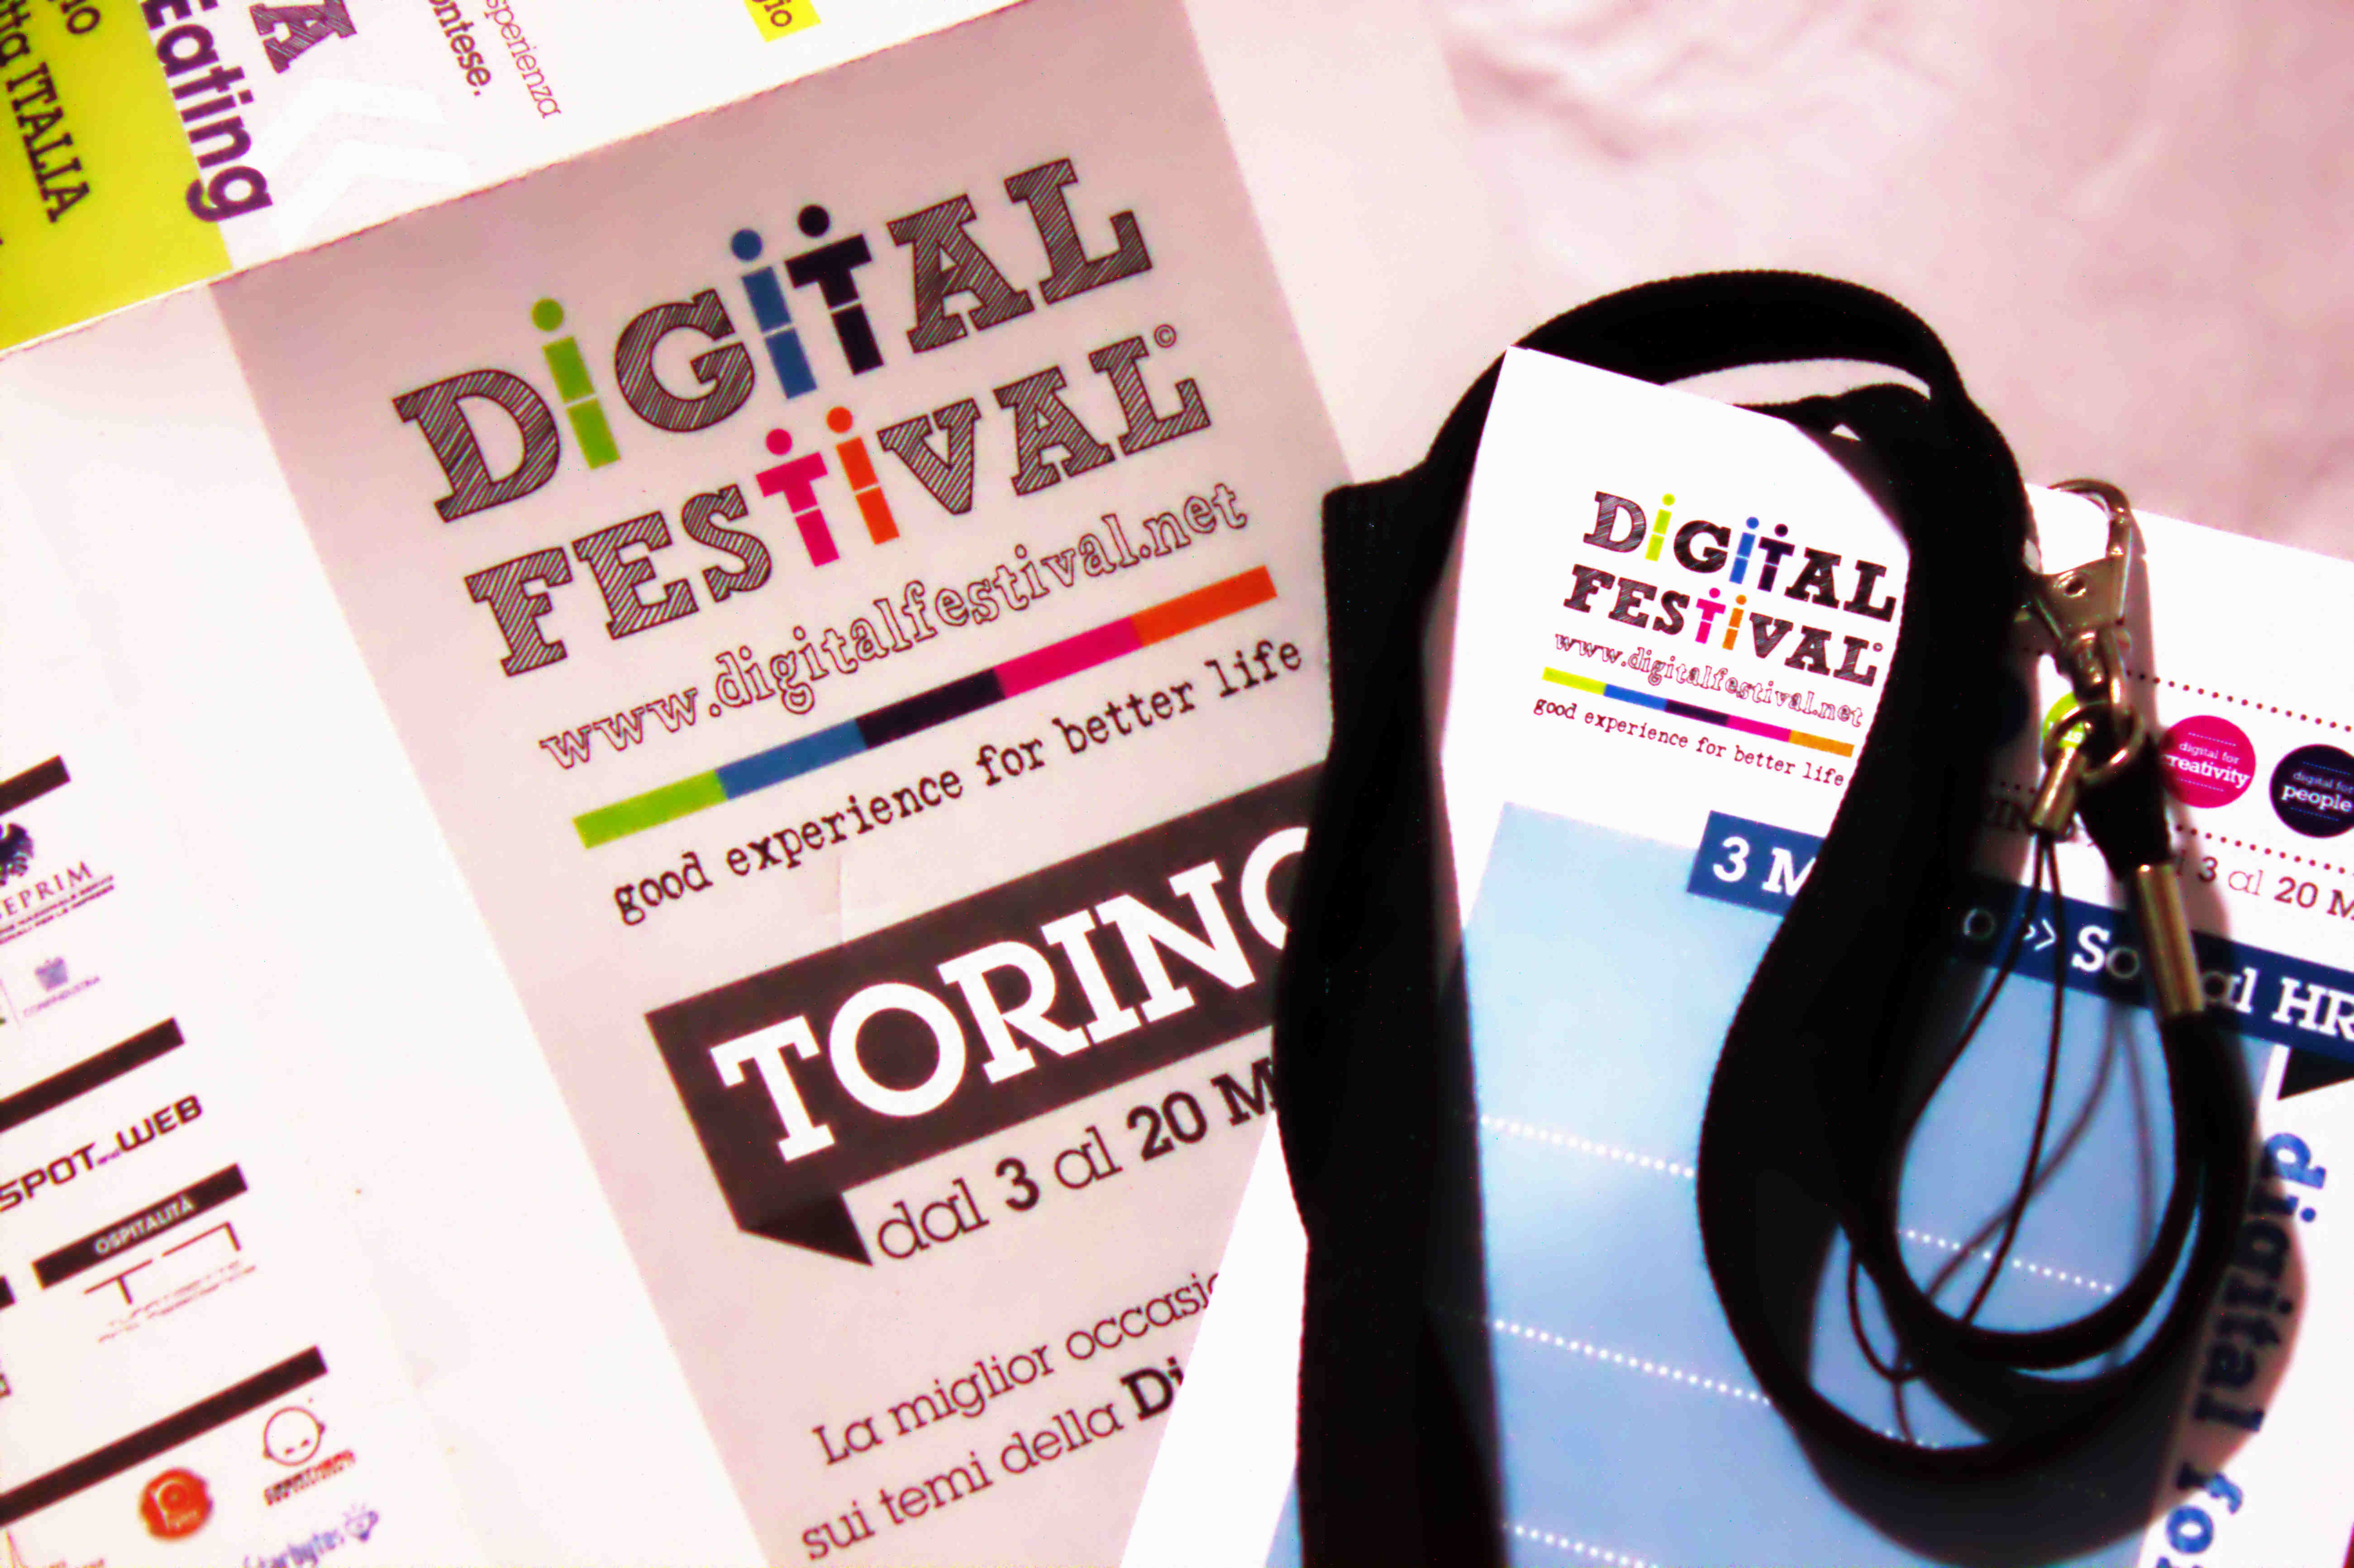 digital_festival_postp